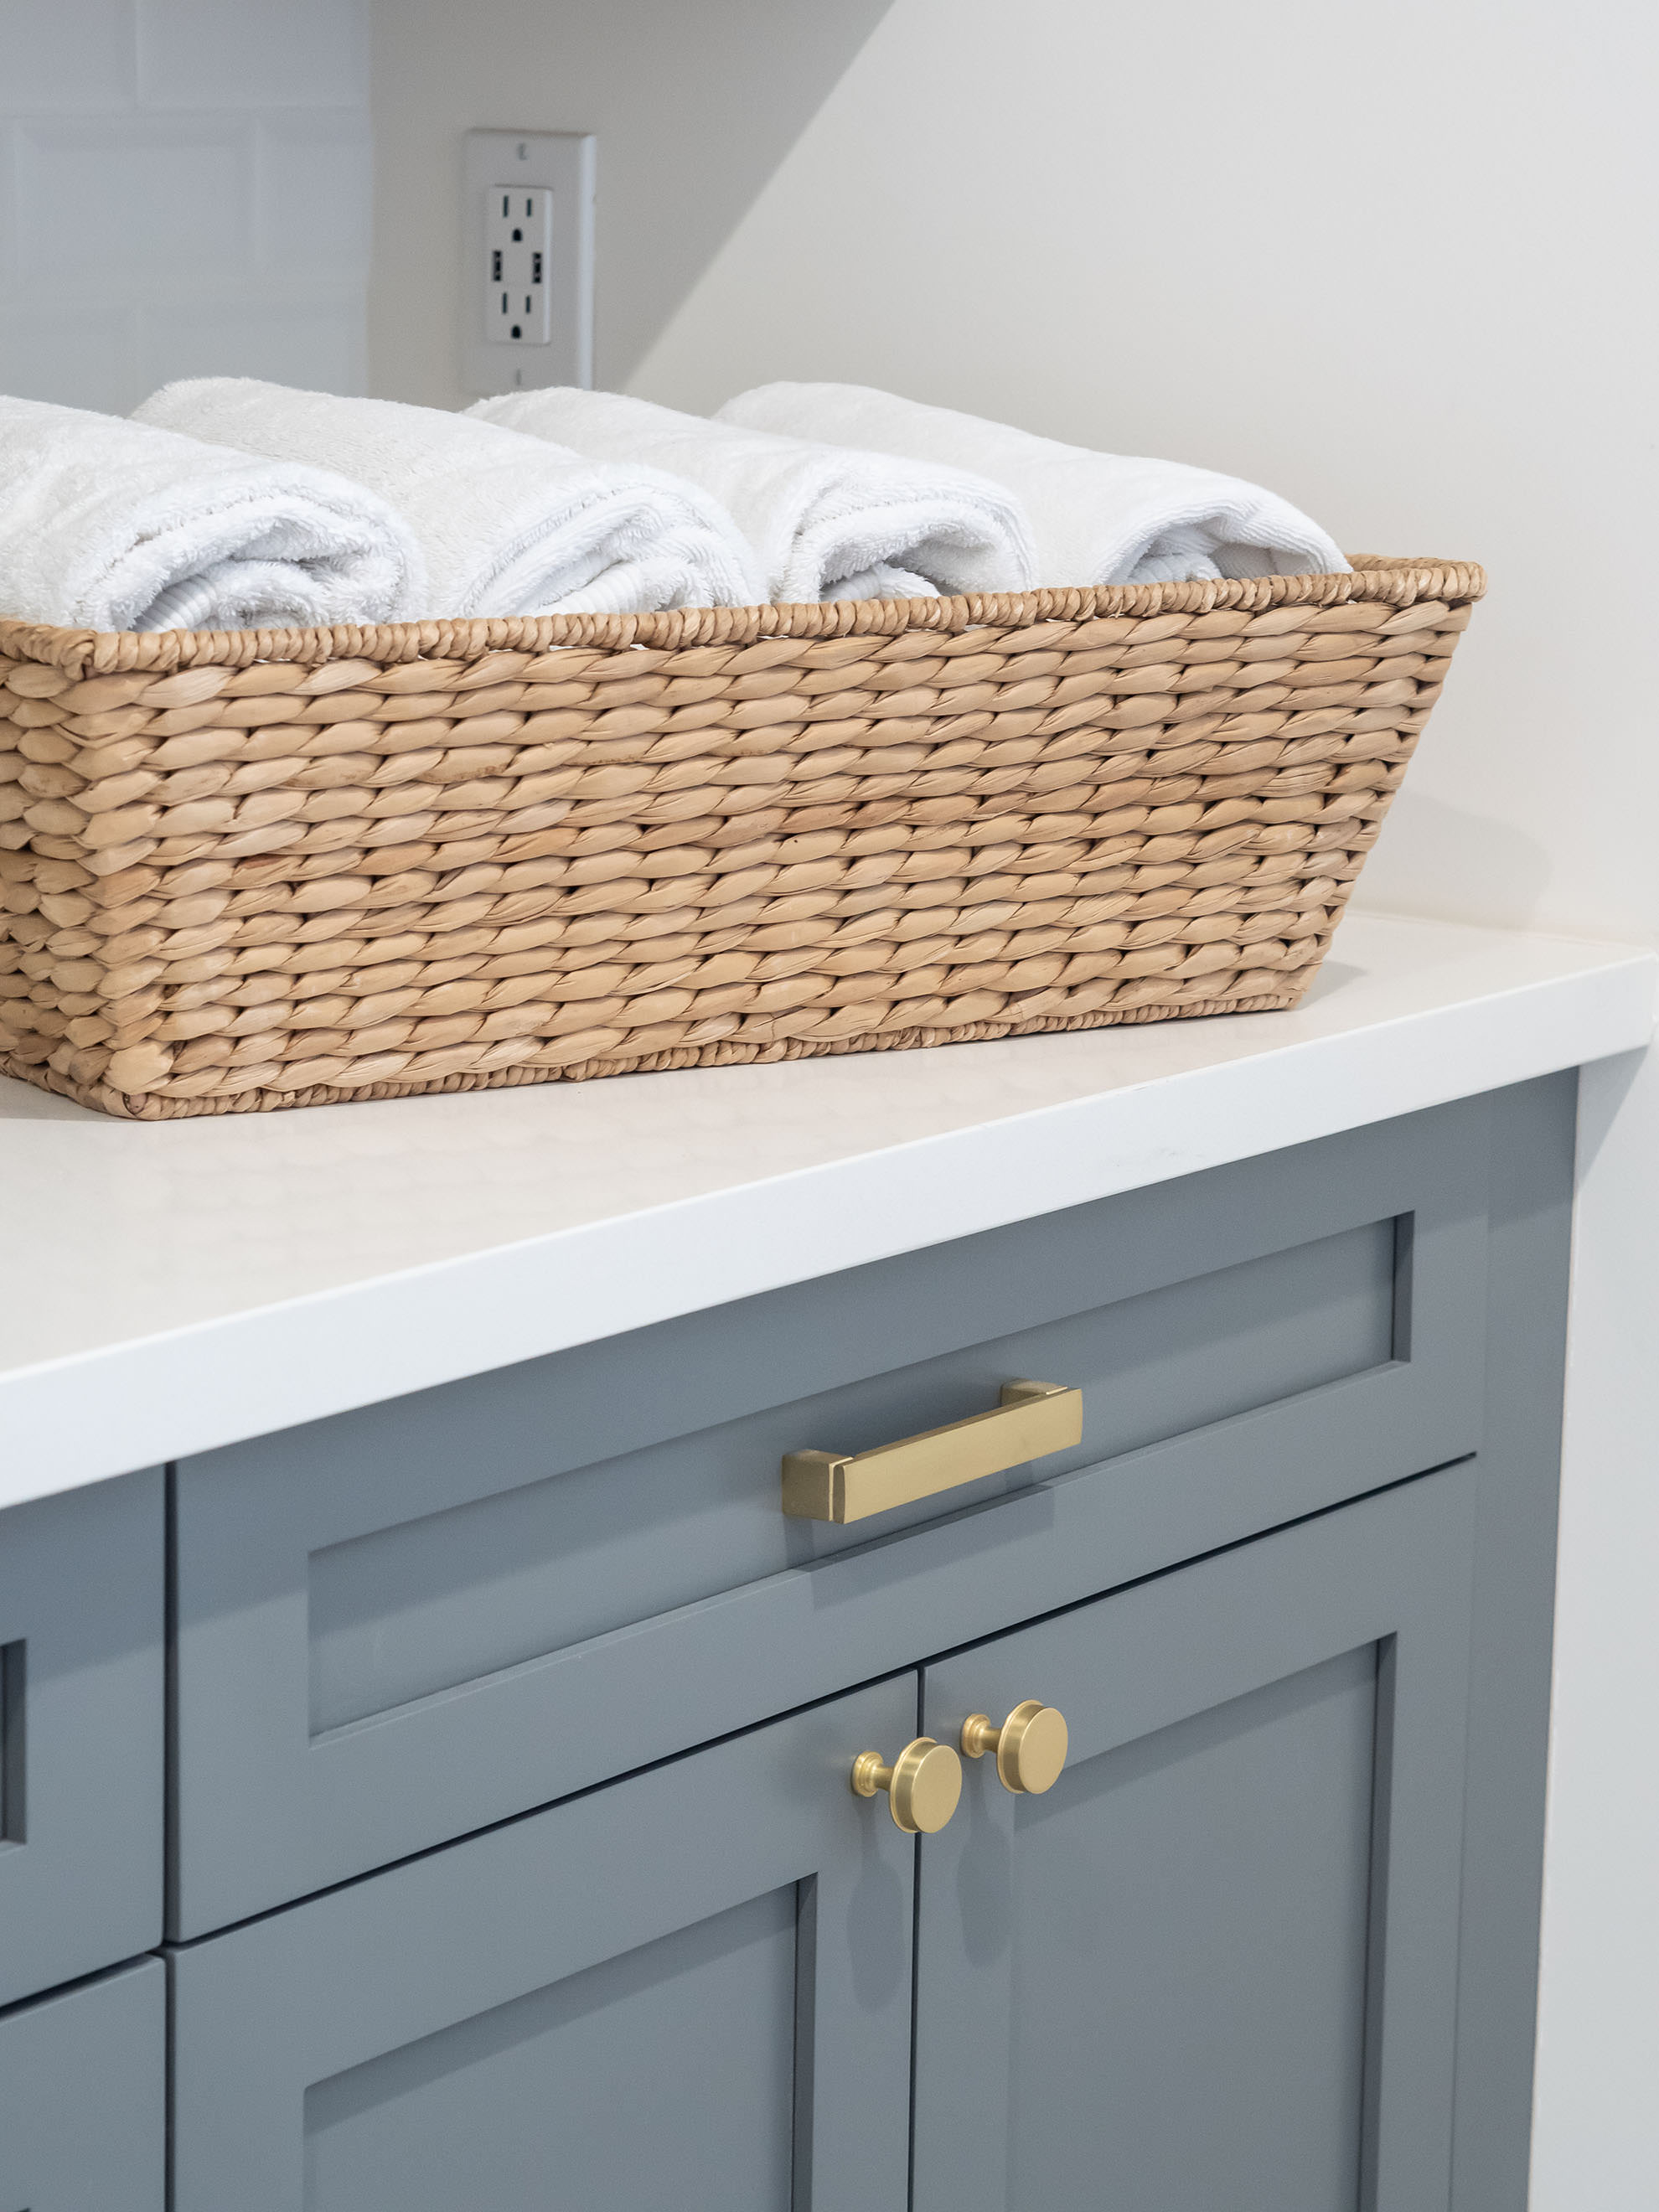 tnd-laundry-1010115.jpg